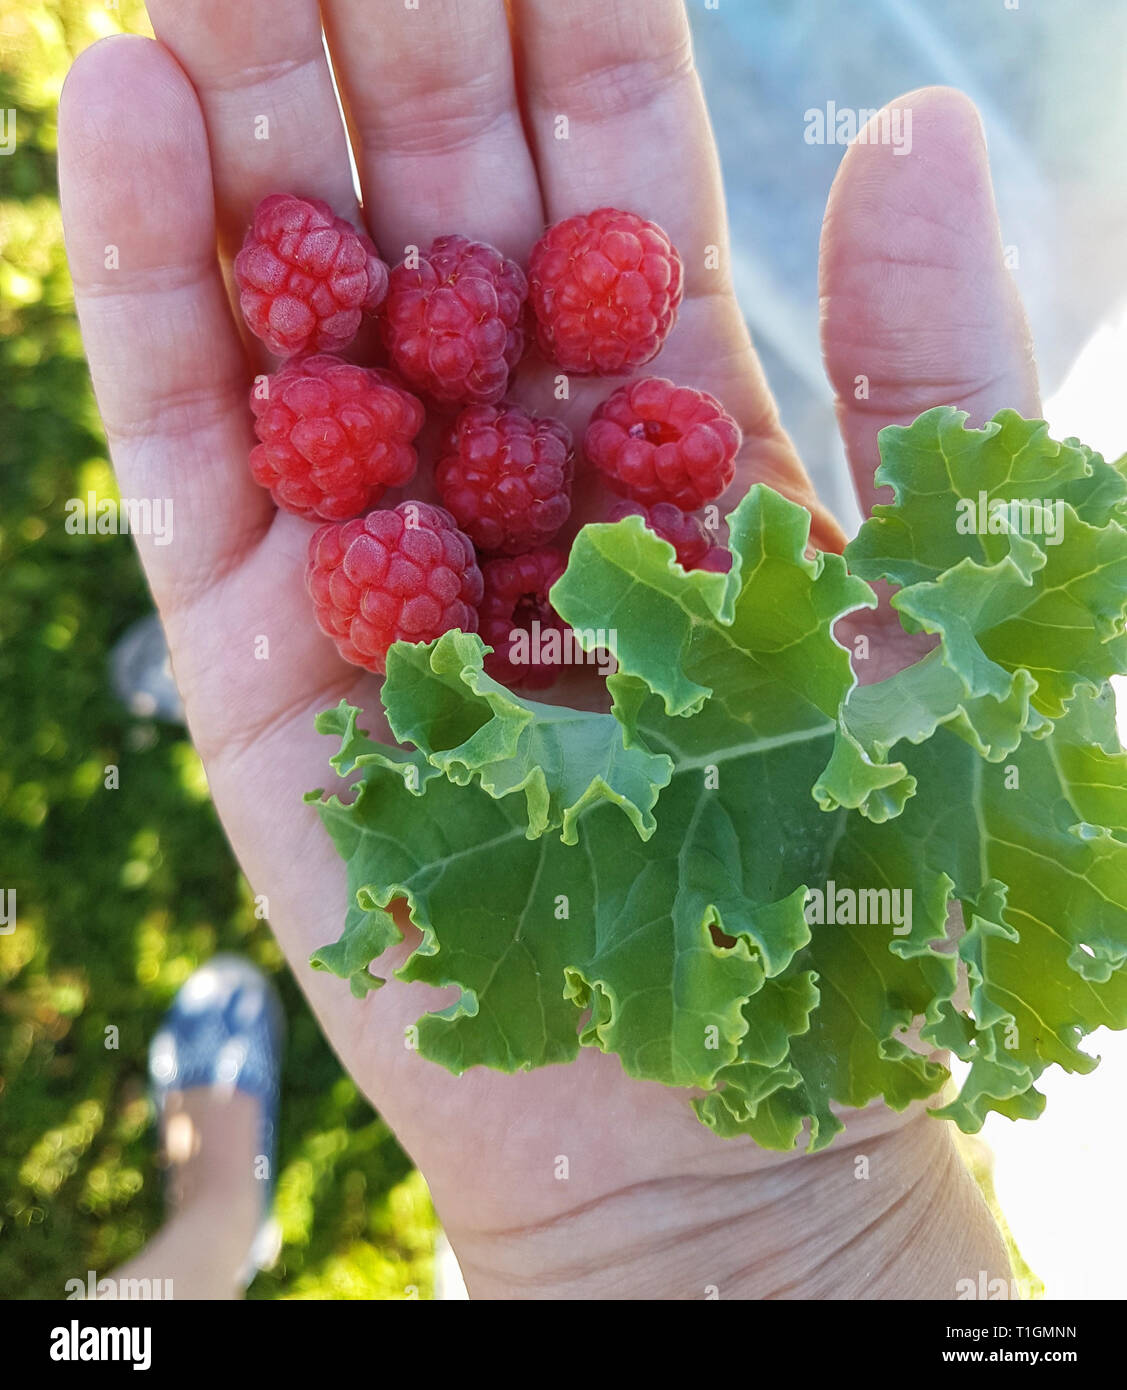 Home grown kale and raspberries. - Stock Image